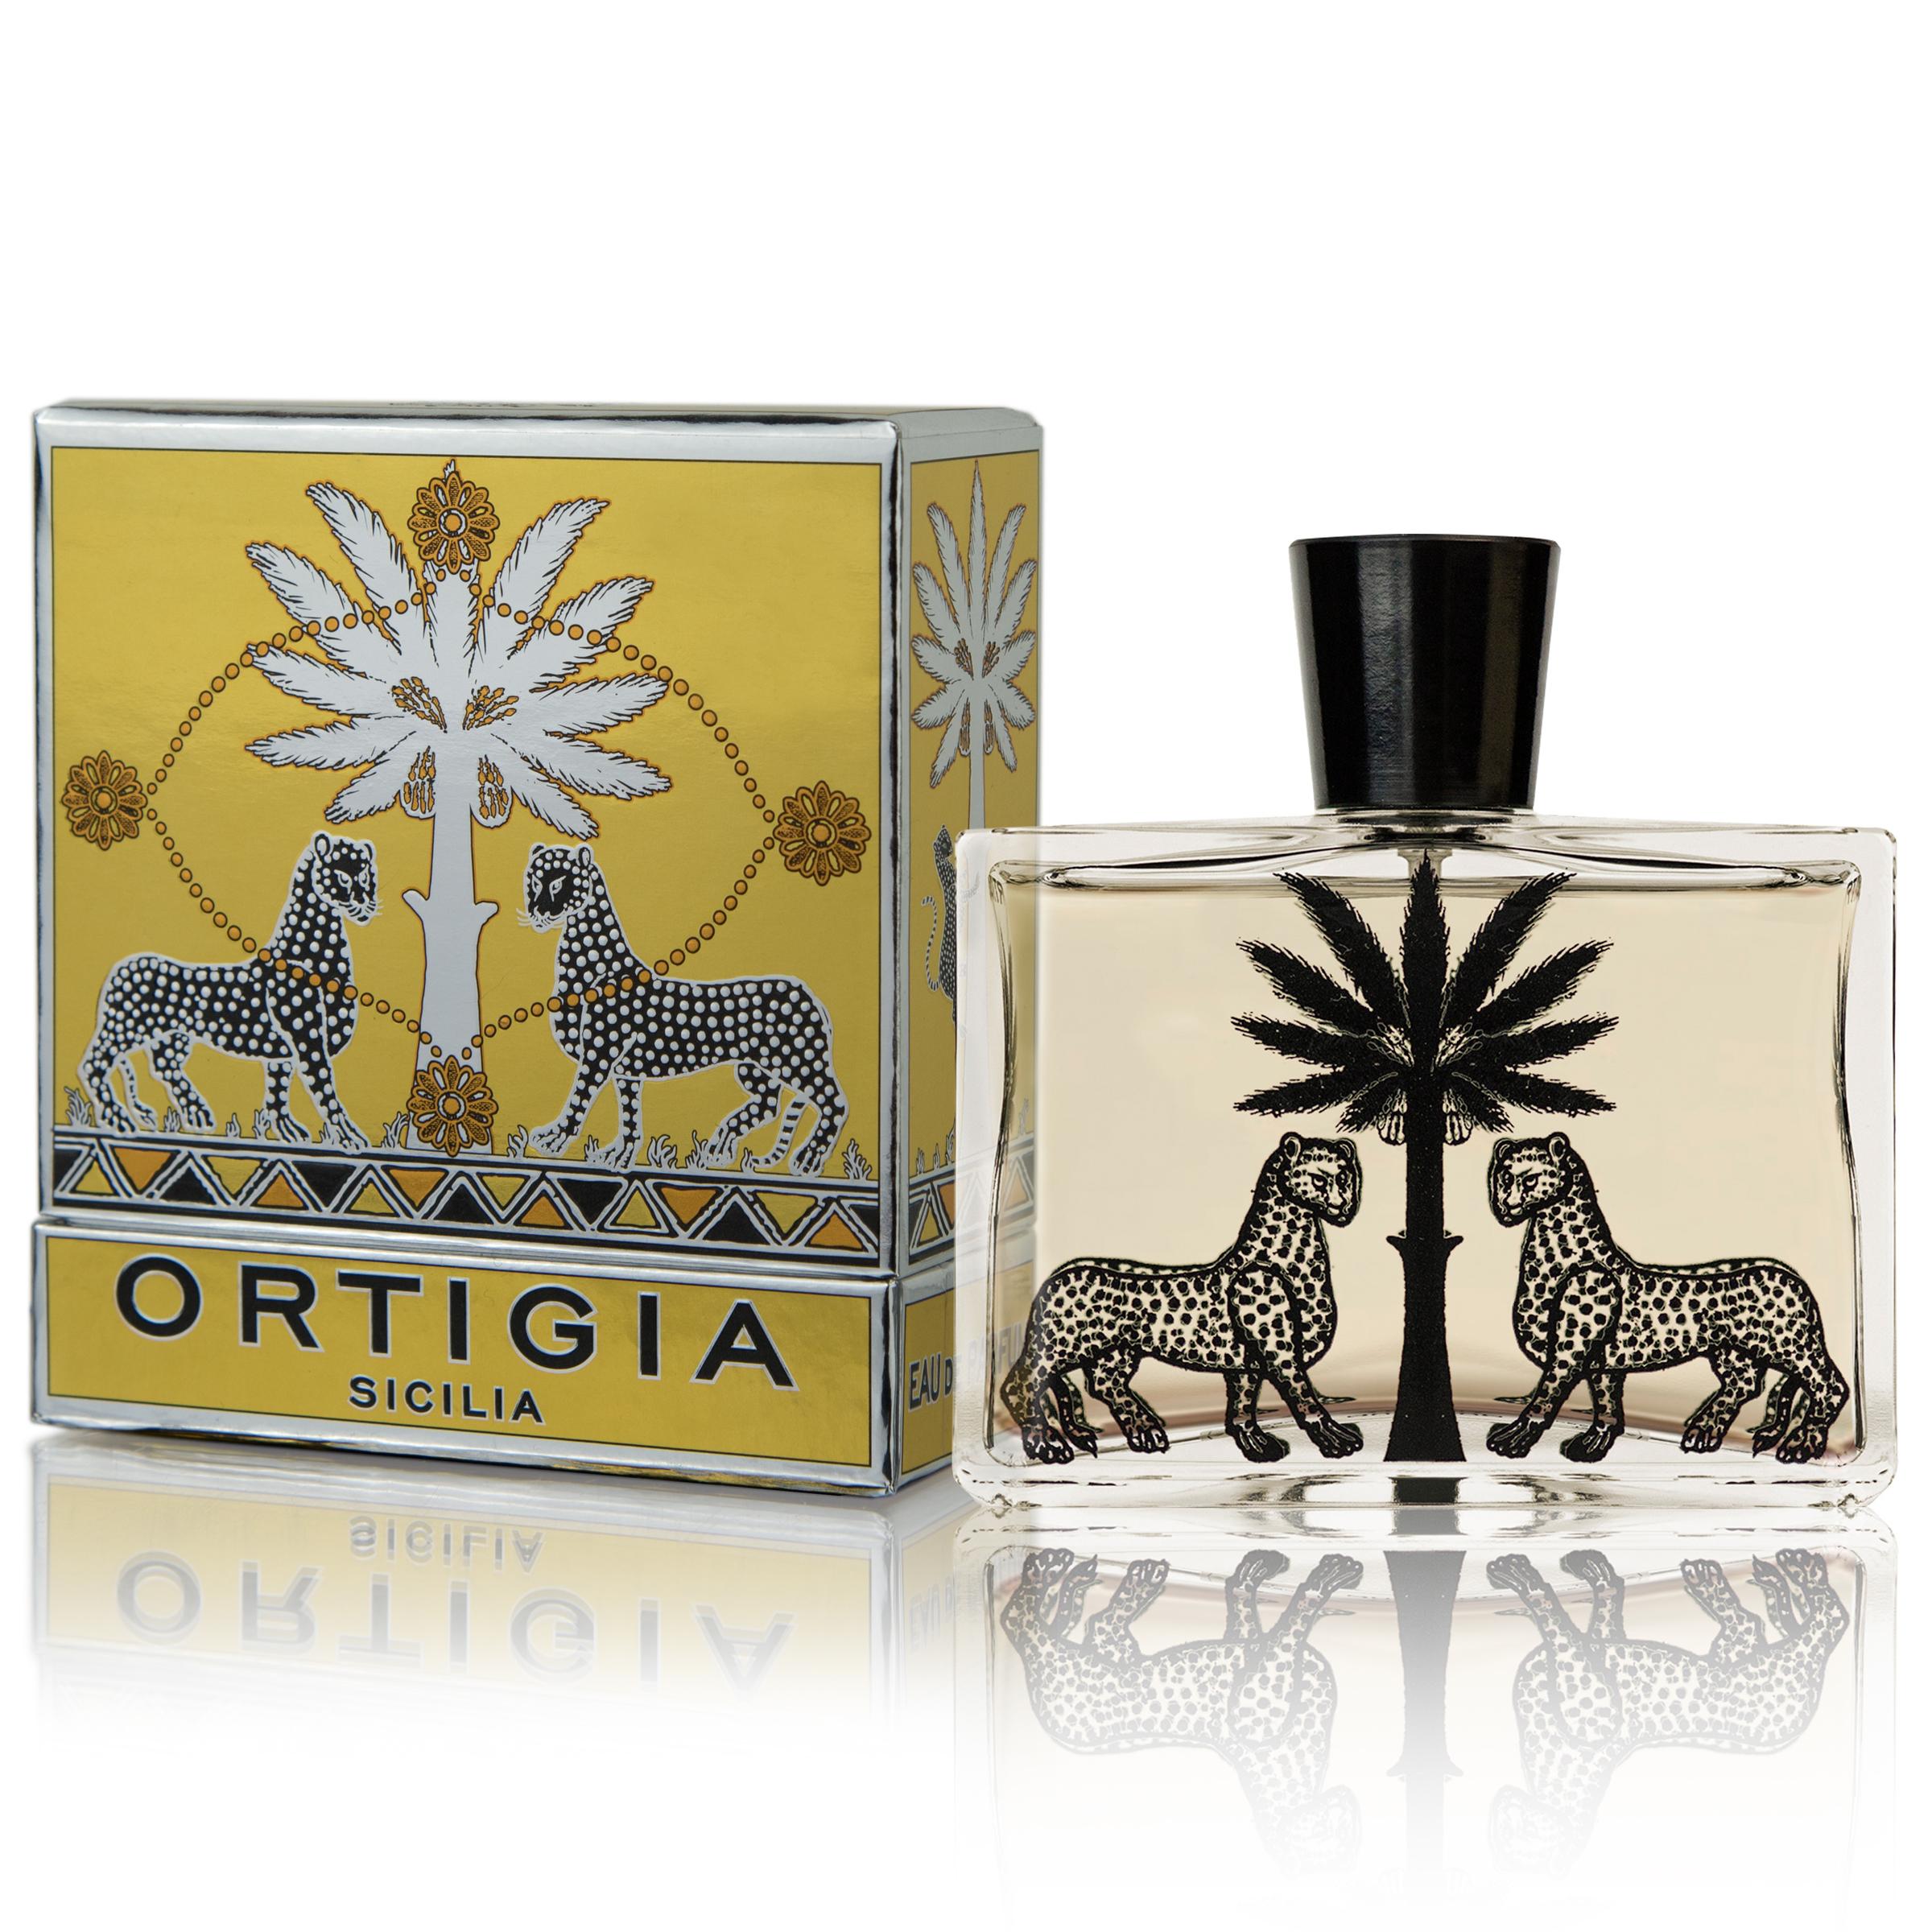 ORTIGIA Zagara Eau de Parfum 100ml